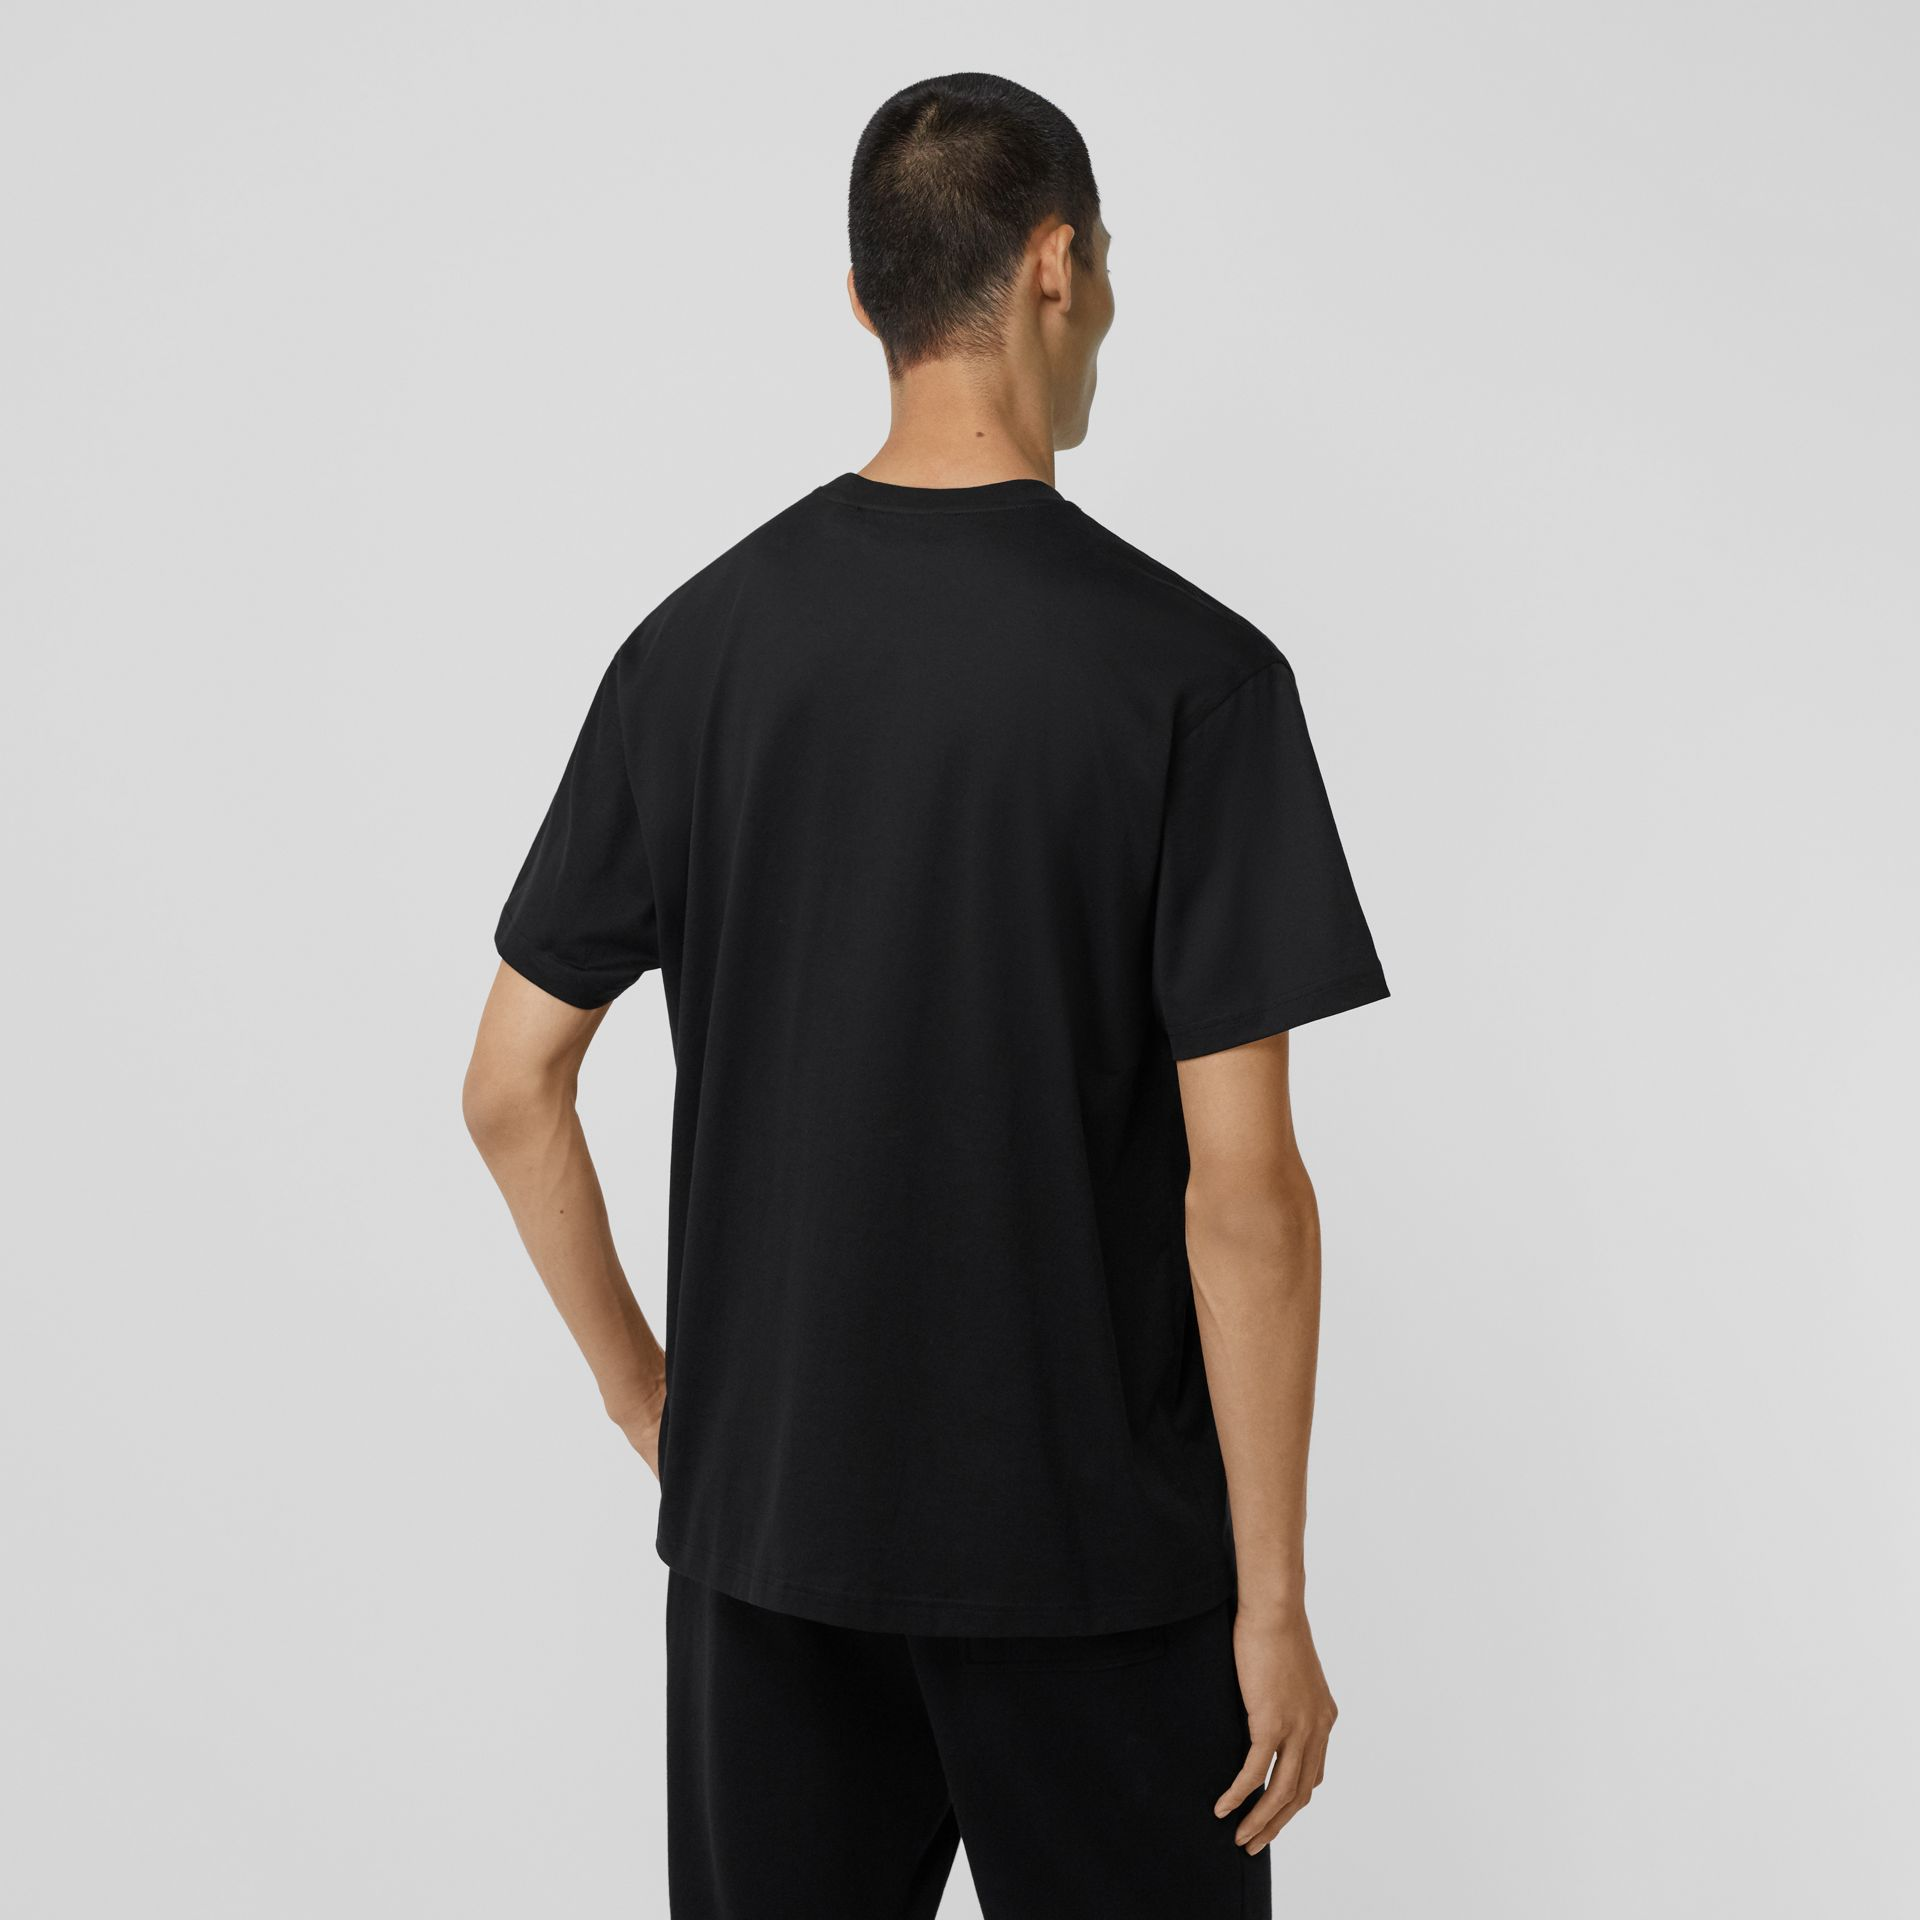 Crystal Monogram Motif Cotton Oversized T-shirt in Black - Men | Burberry - gallery image 2